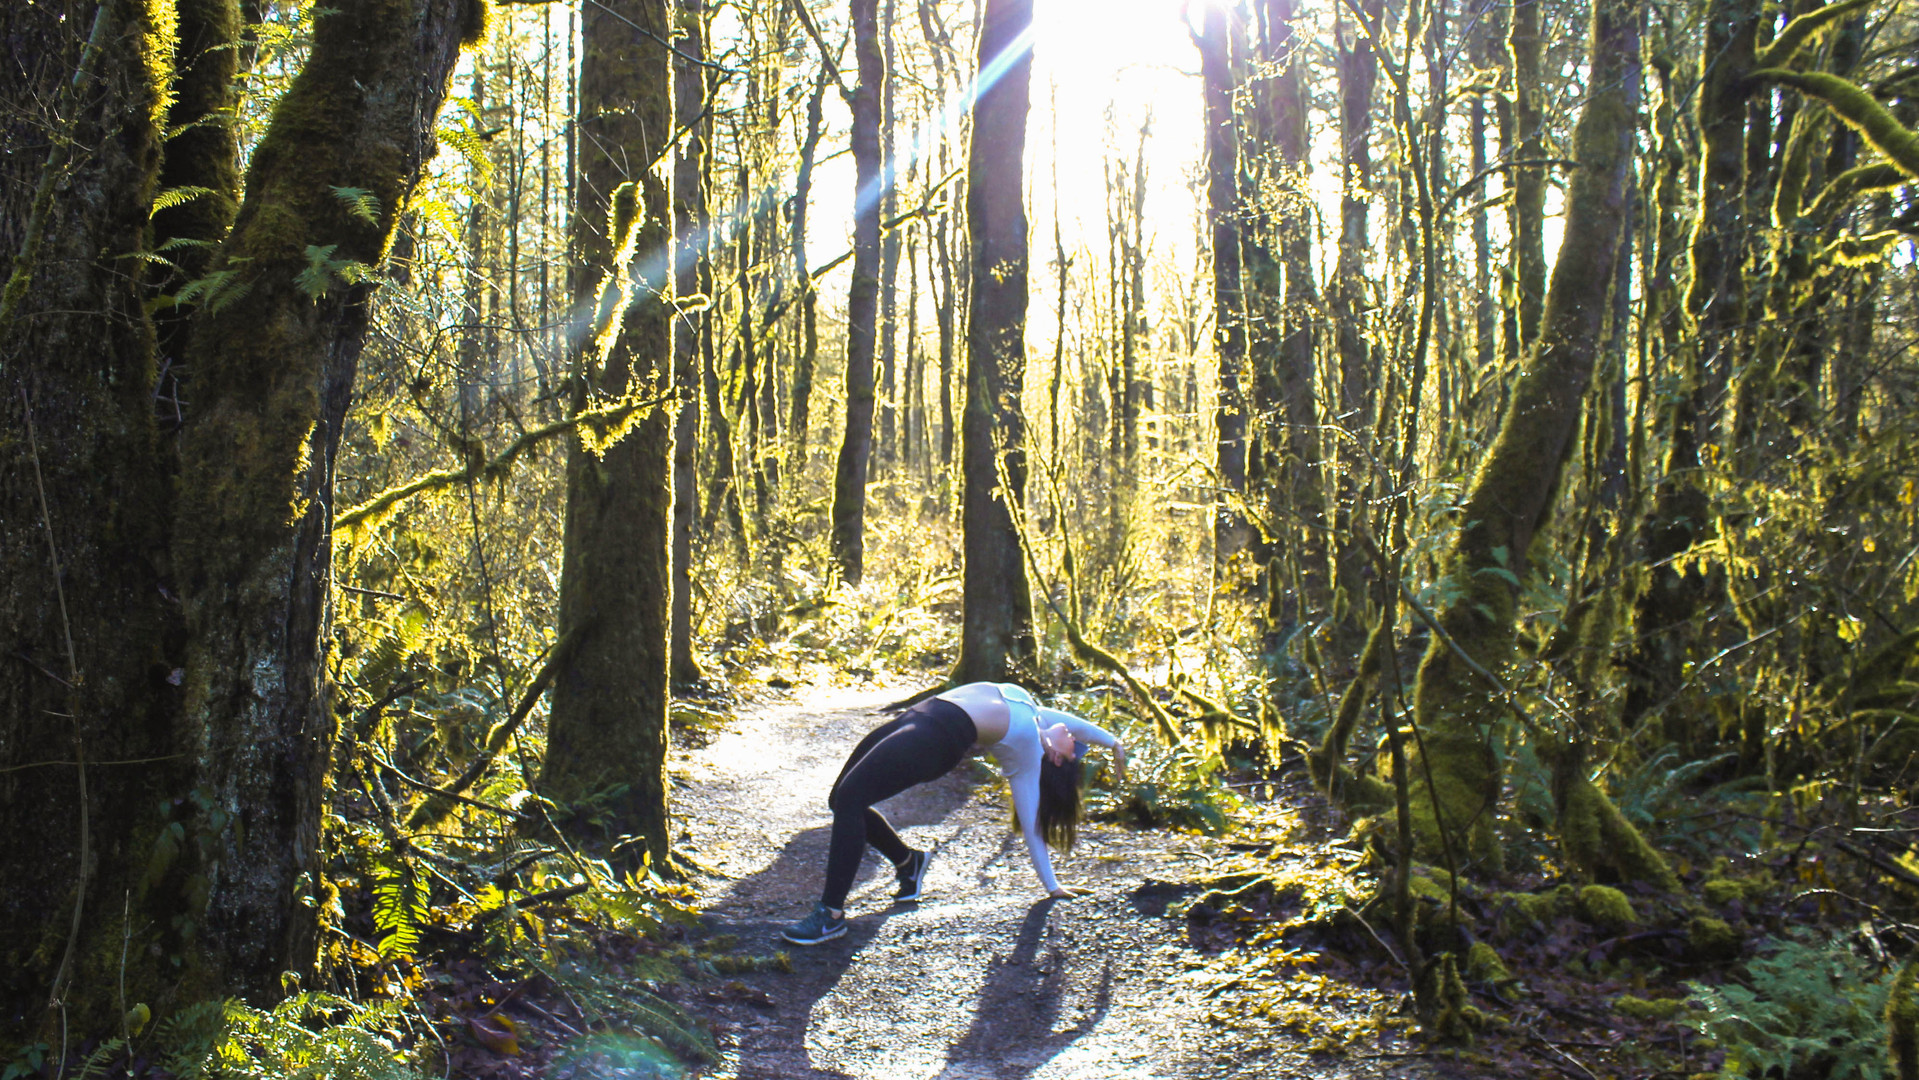 Yoga in the Forest_Carris Bennett Christianson